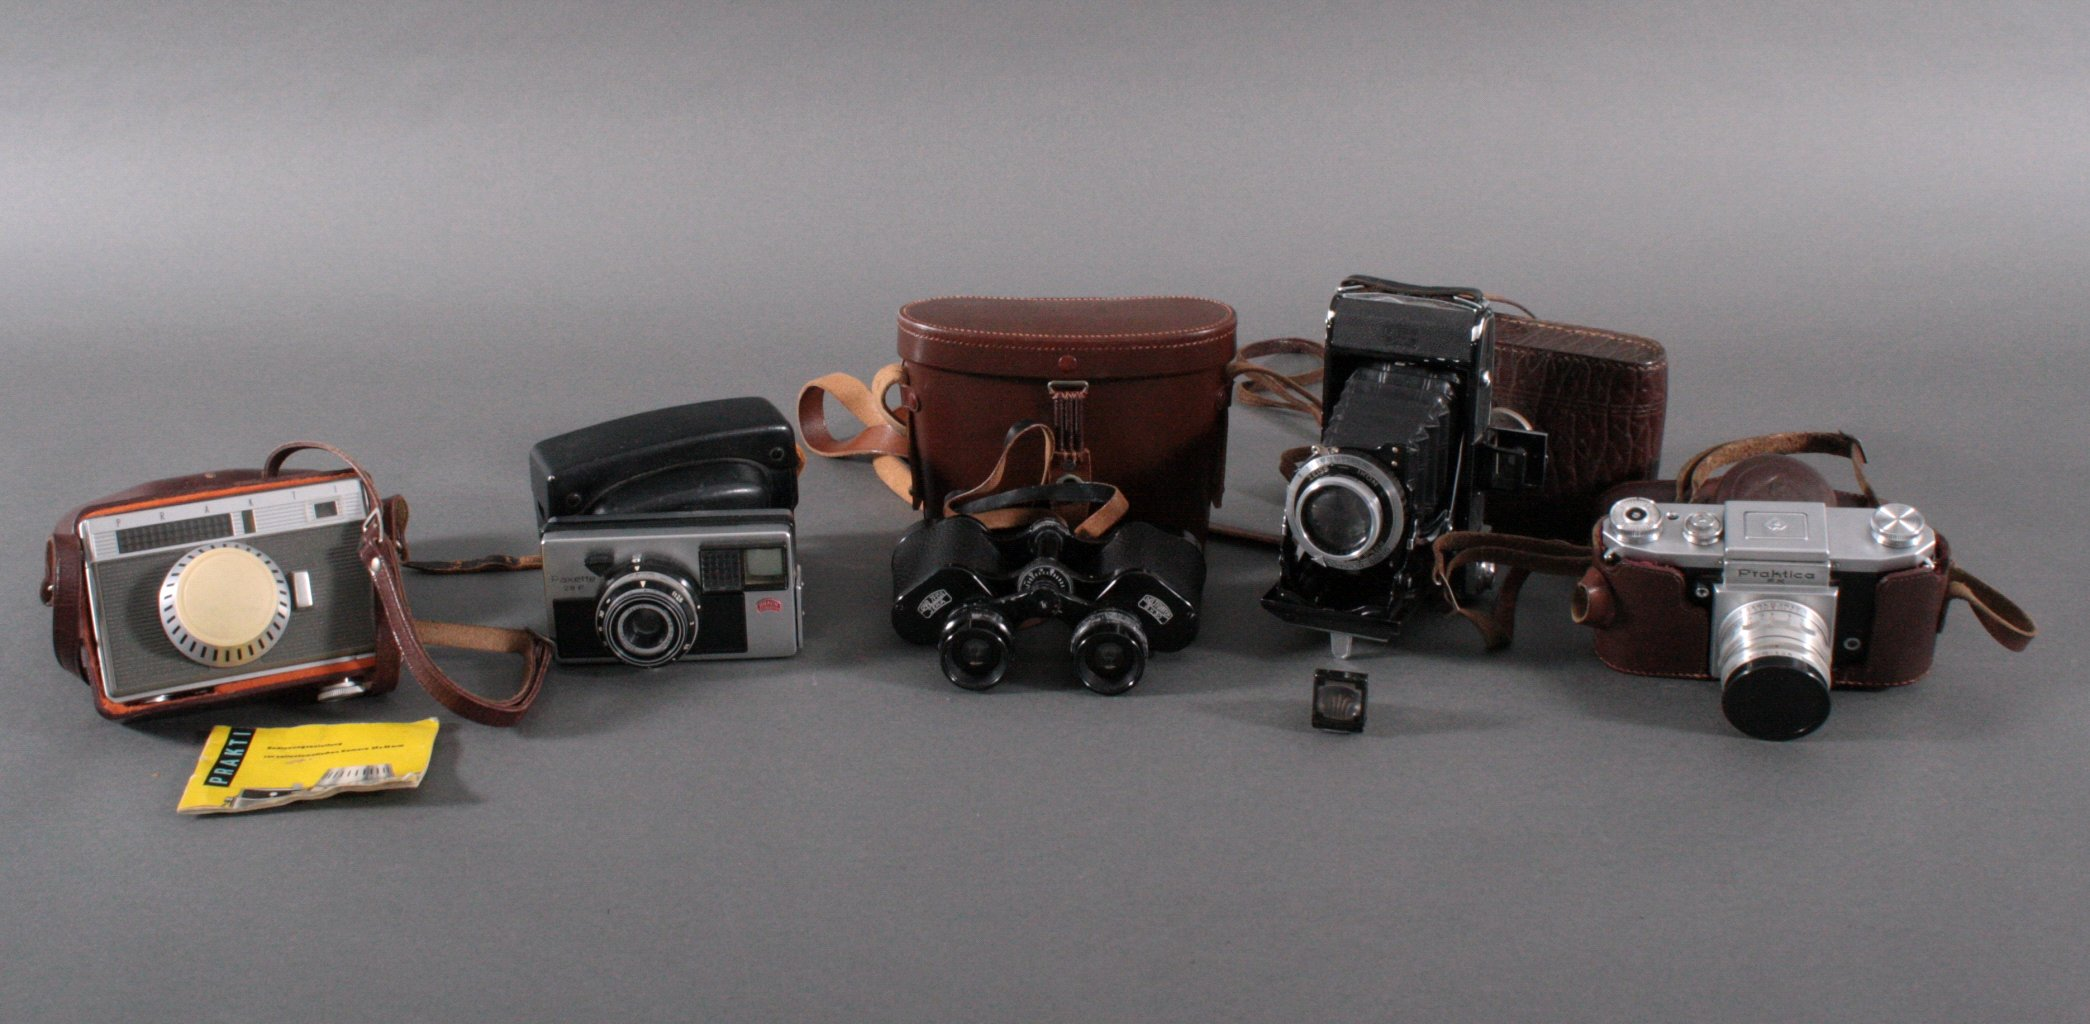 Konvolut Fotoapparate und Fernglas